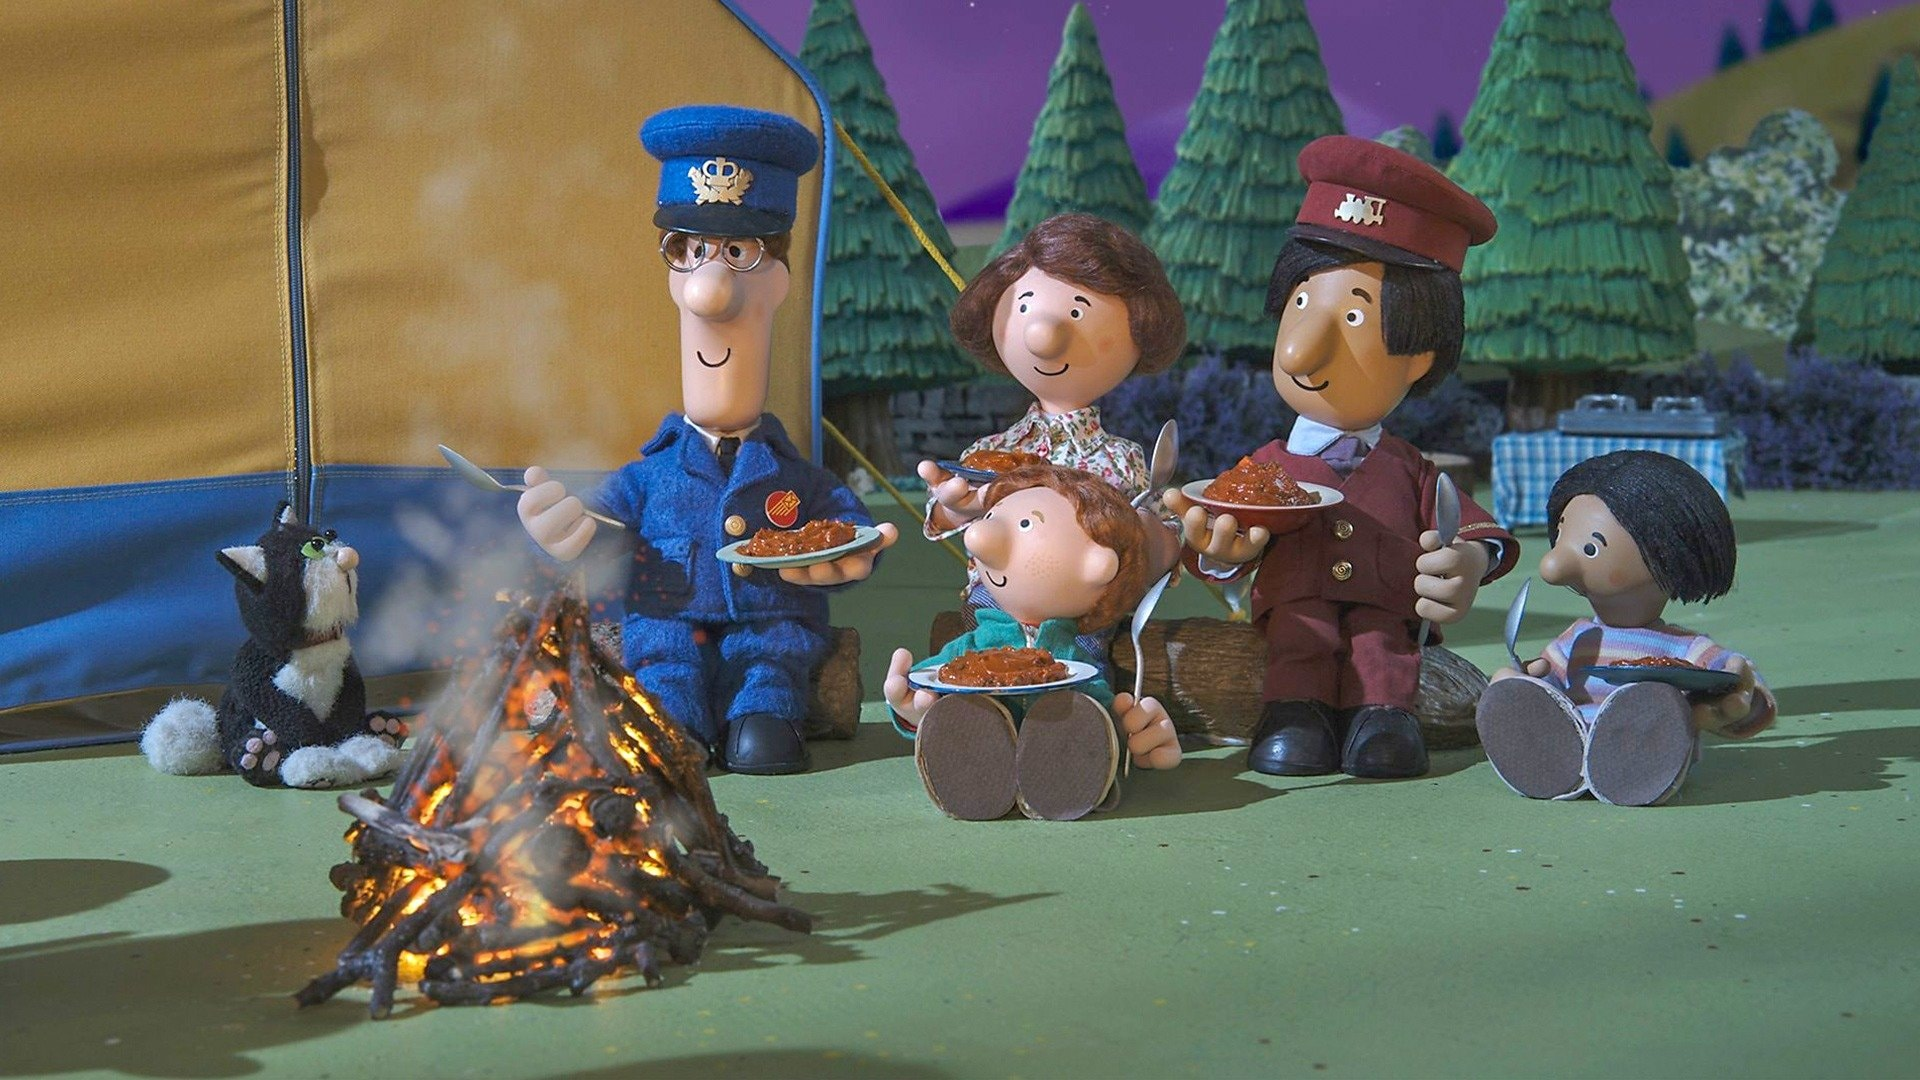 Postman Pat's Camping Chaos